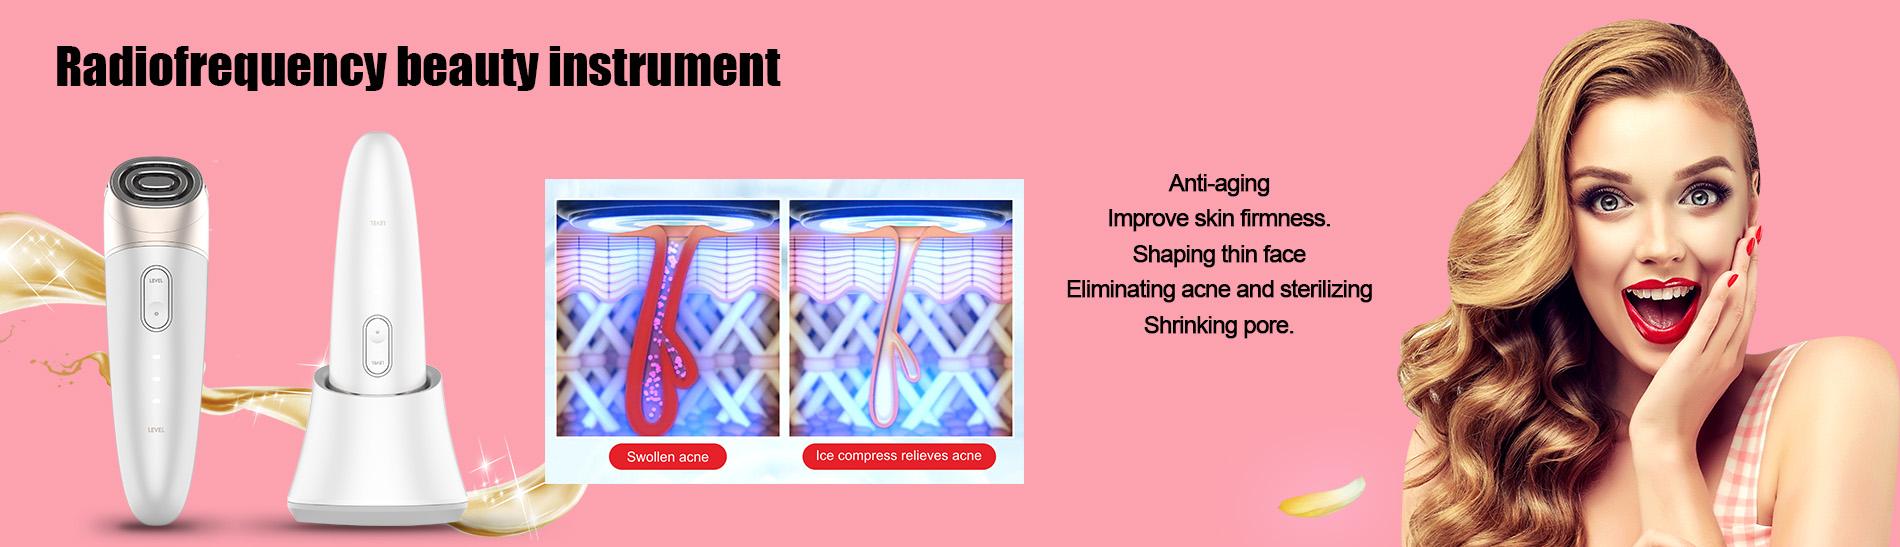 olansi beauty instrument manufacturer 8